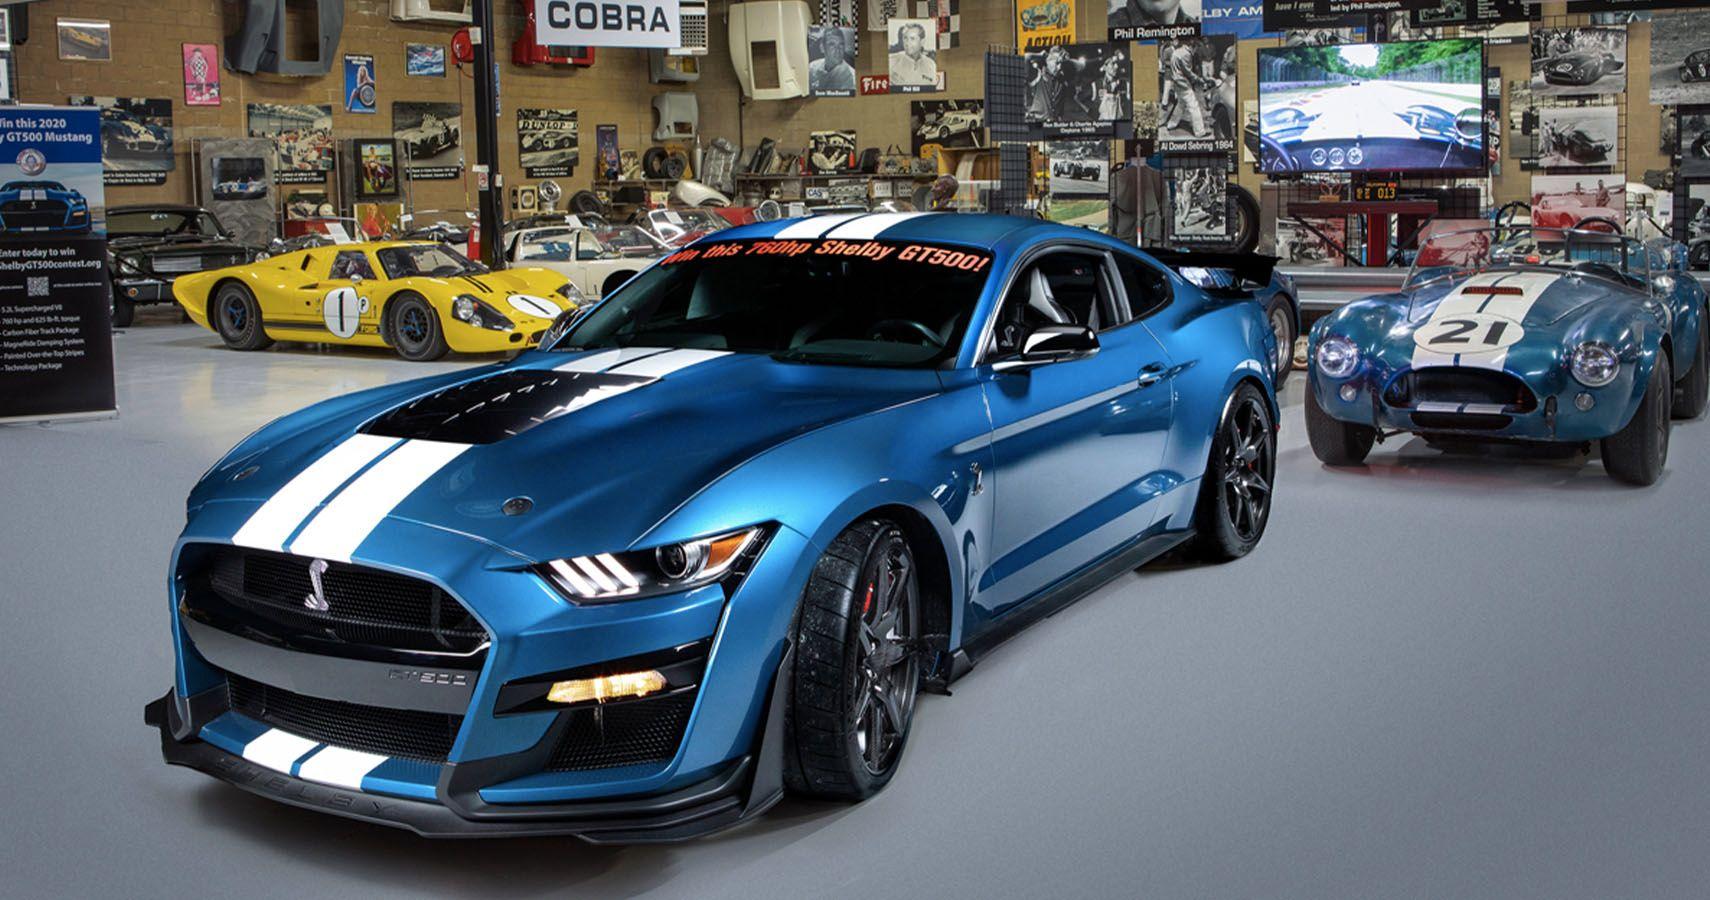 Shelby American Museum Raffling A 2020 GT500